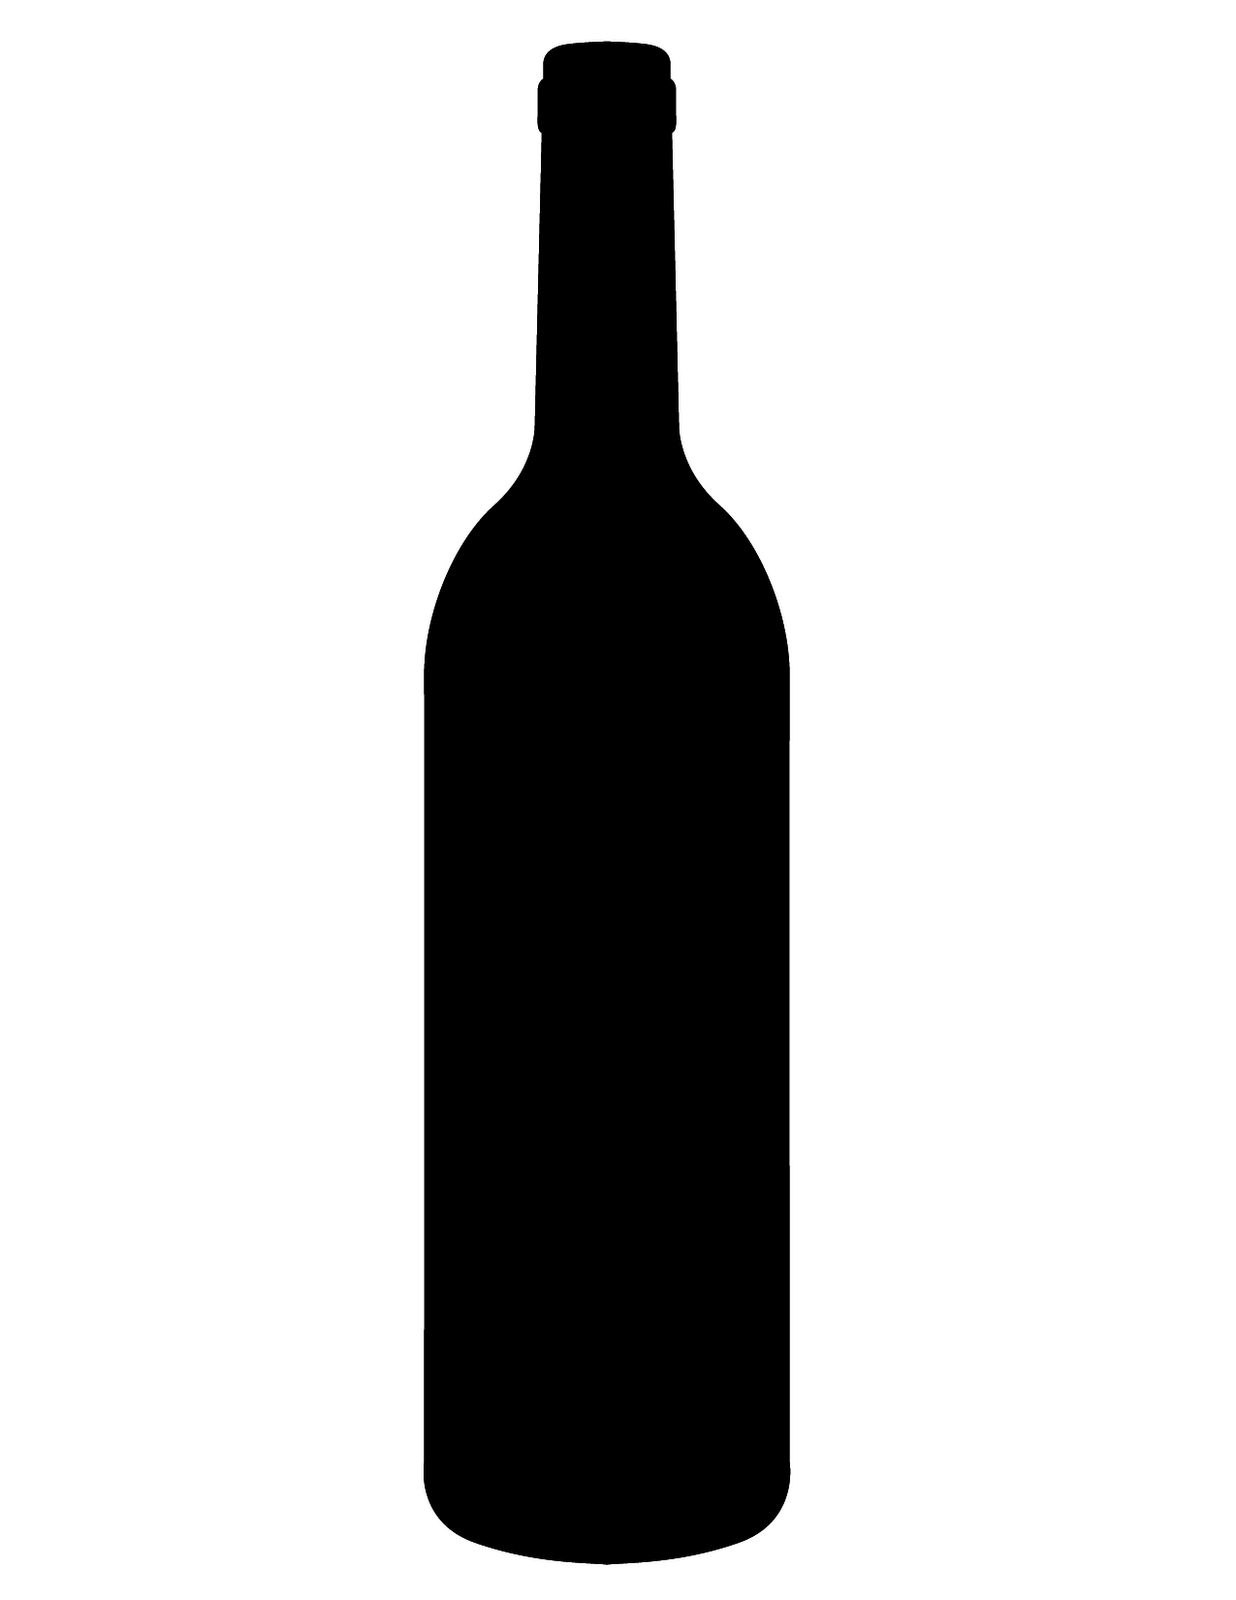 $40 Bottle (Vision Loss Alliance)